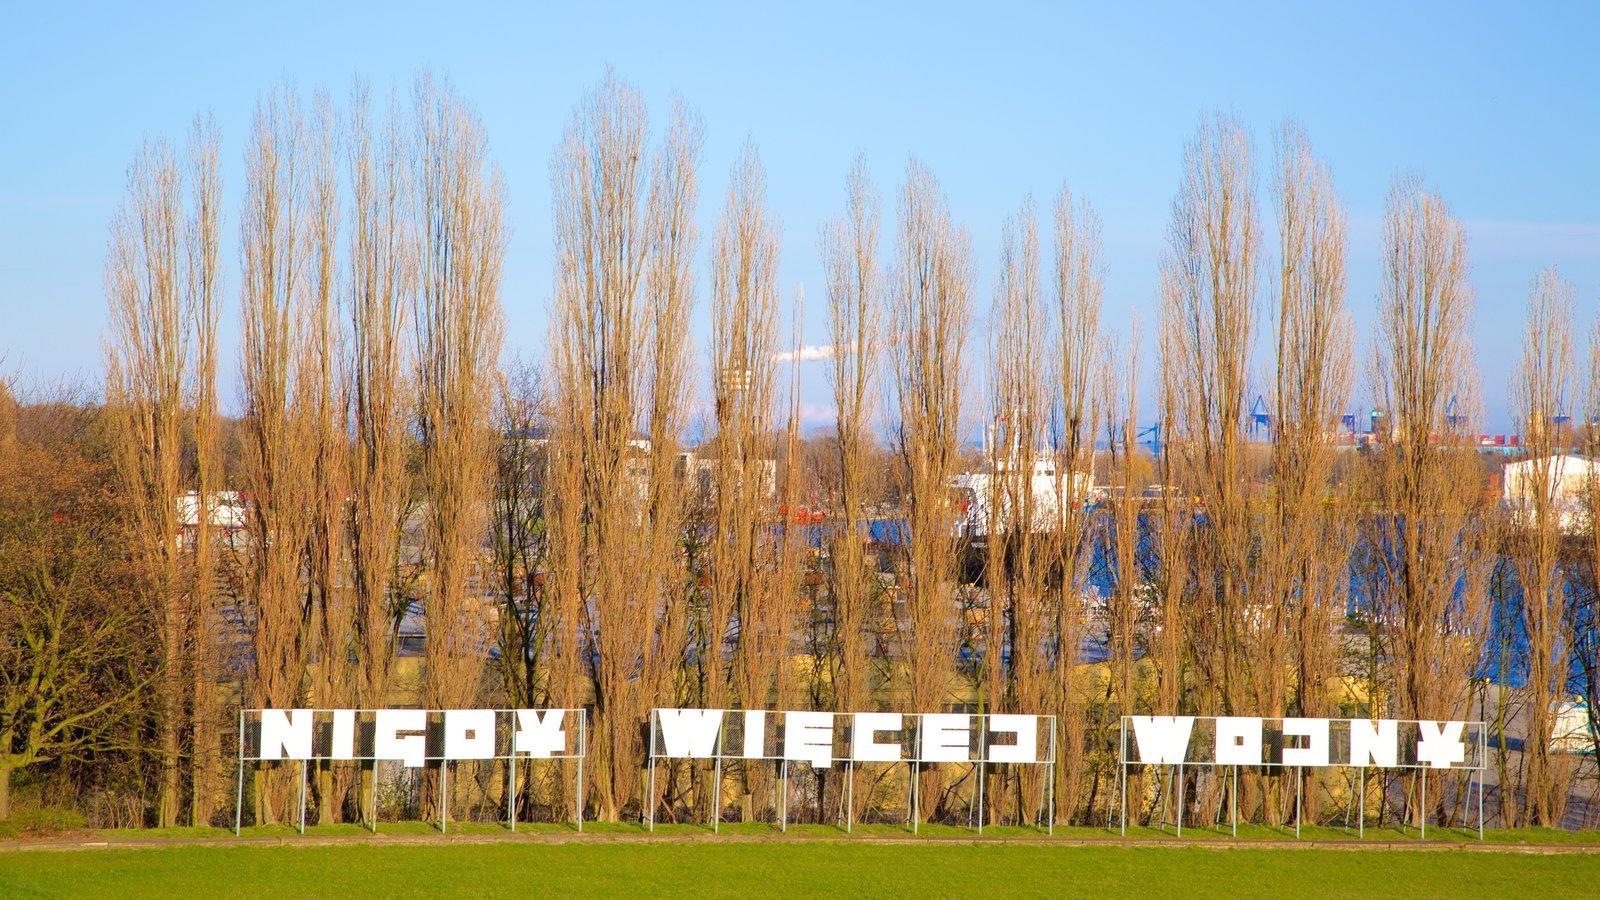 Monumento de Westerplatte caracterizando um jardim